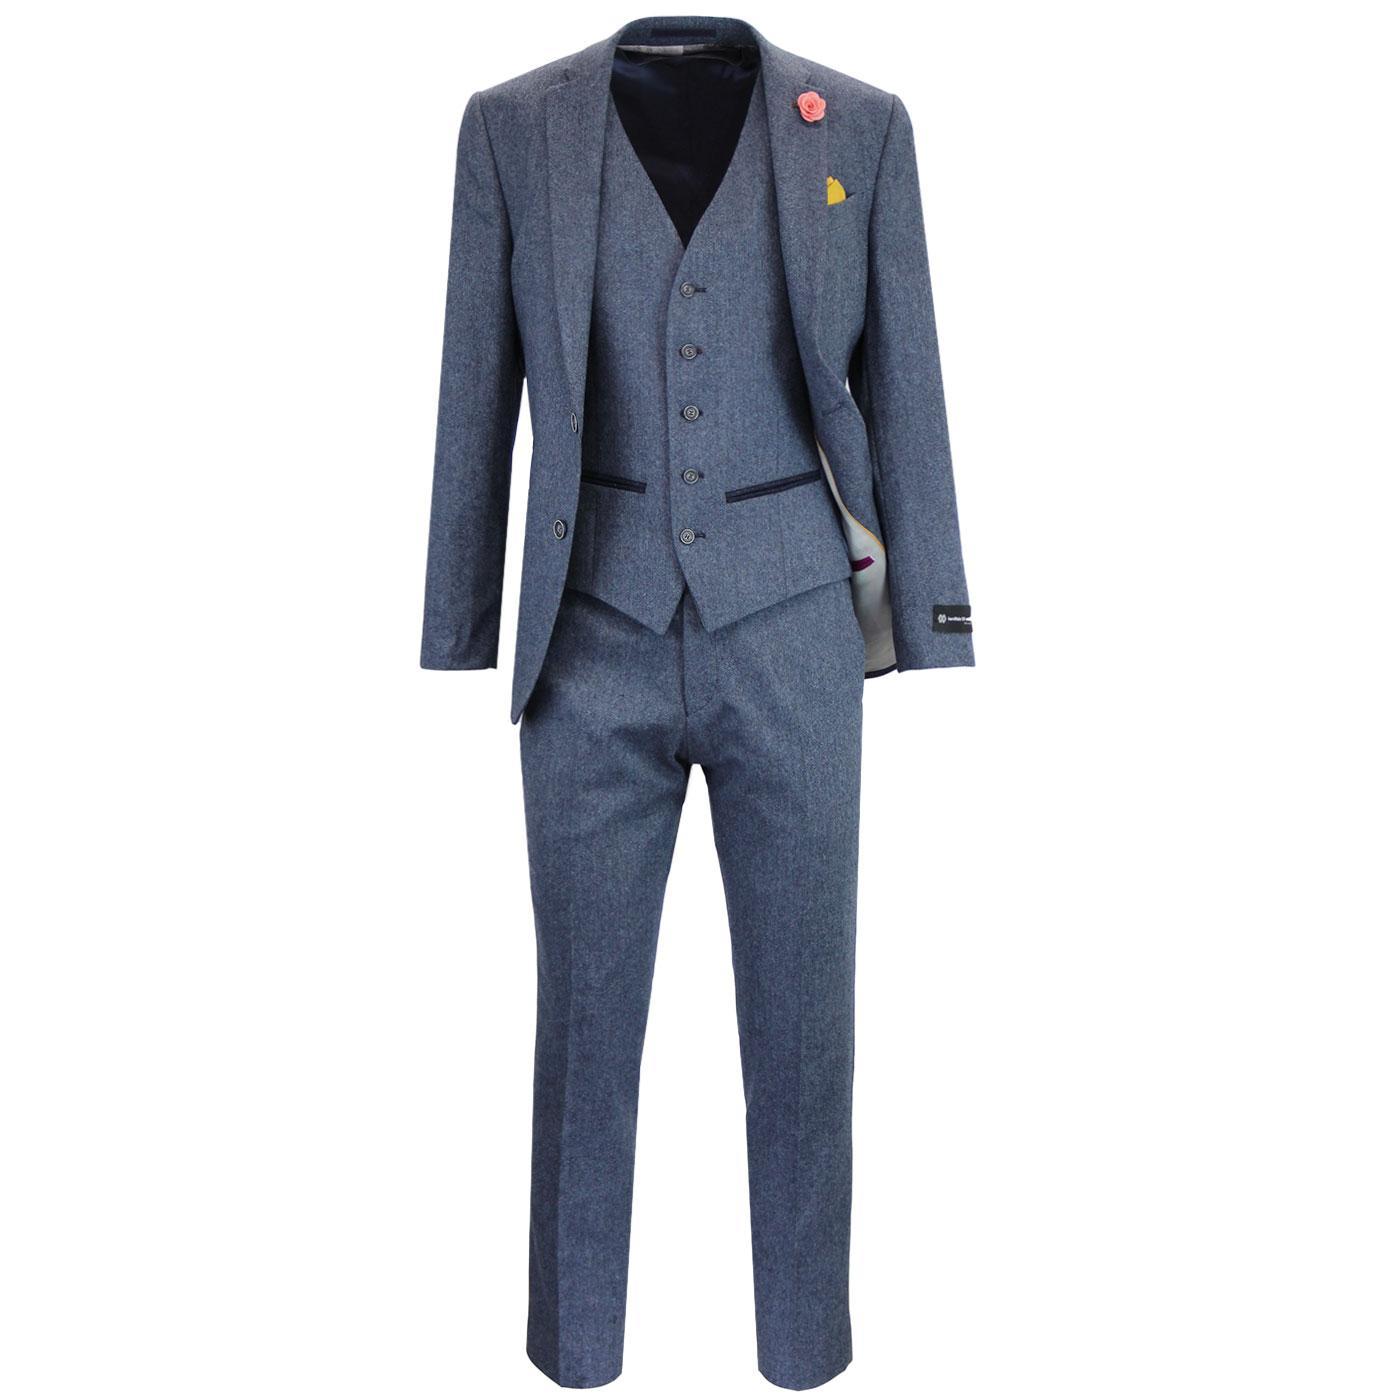 Mens Retro 60s Mod 3 Piece Donegal Suit in Blue